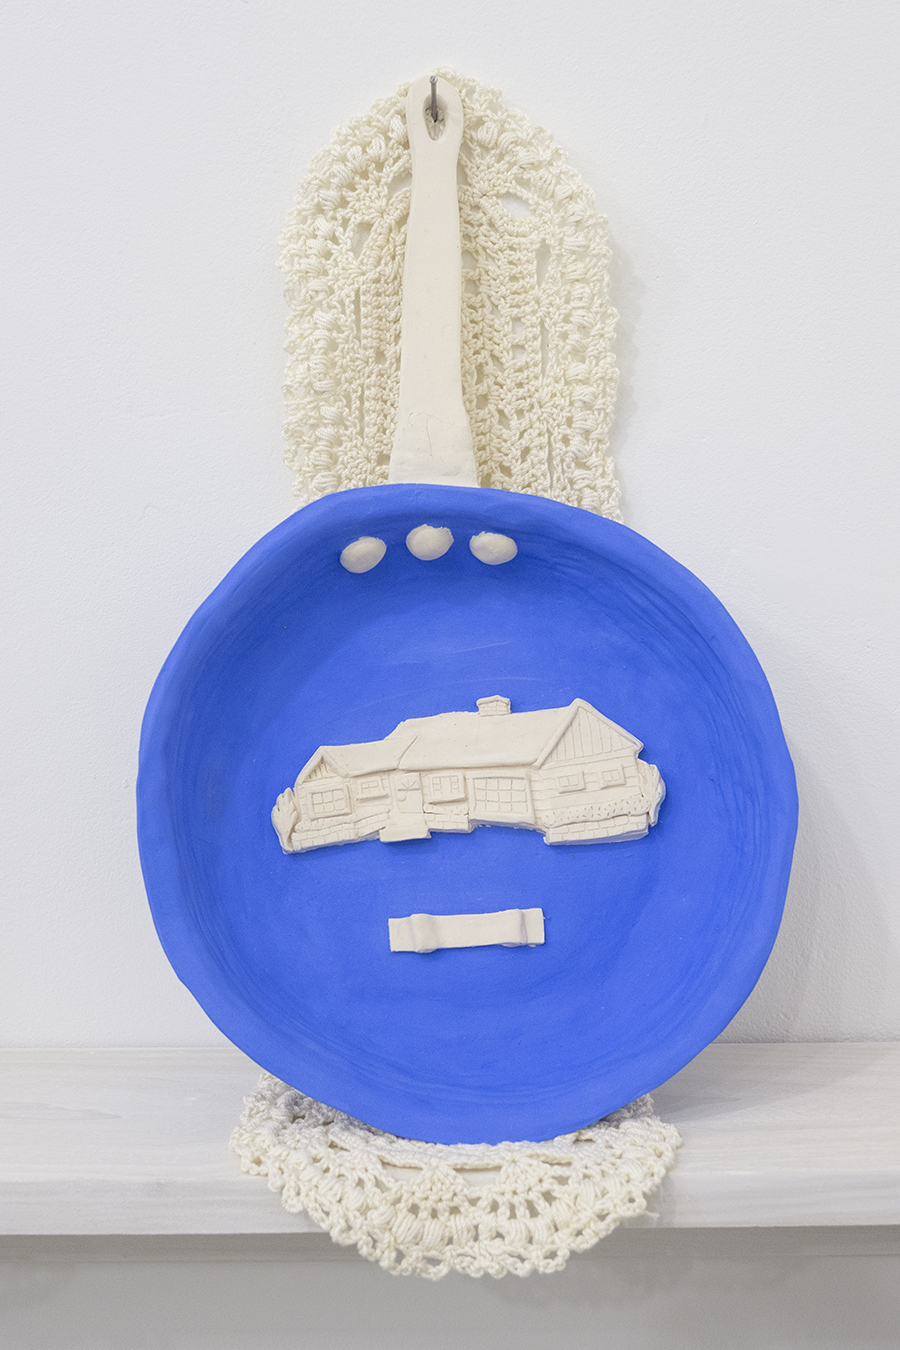 frying pan / ranch house (1940s-1970s),  2018  Glazed stoneware, mercerized cotton thread